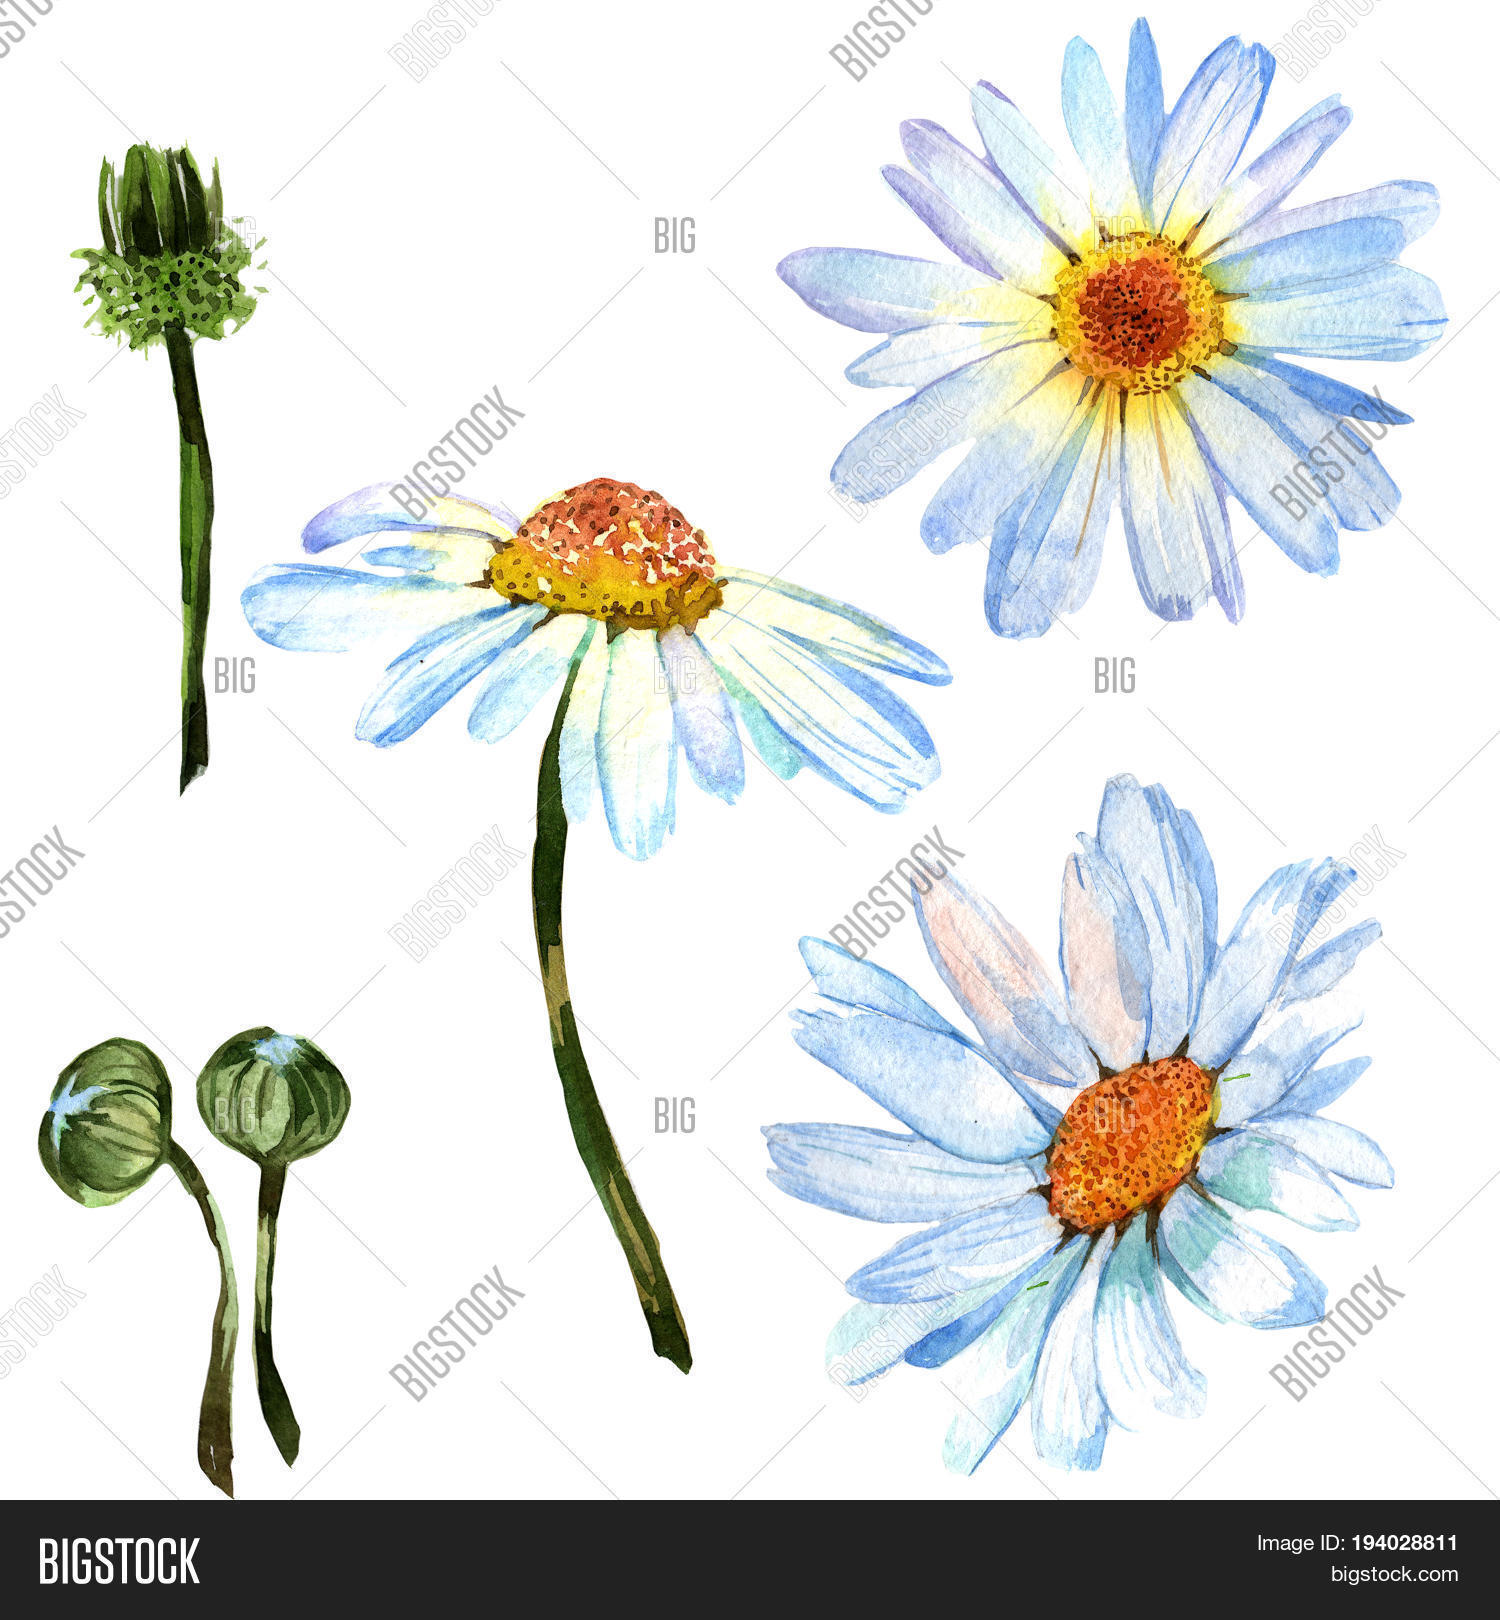 Wildflower Daisy Image Photo Free Trial Bigstock